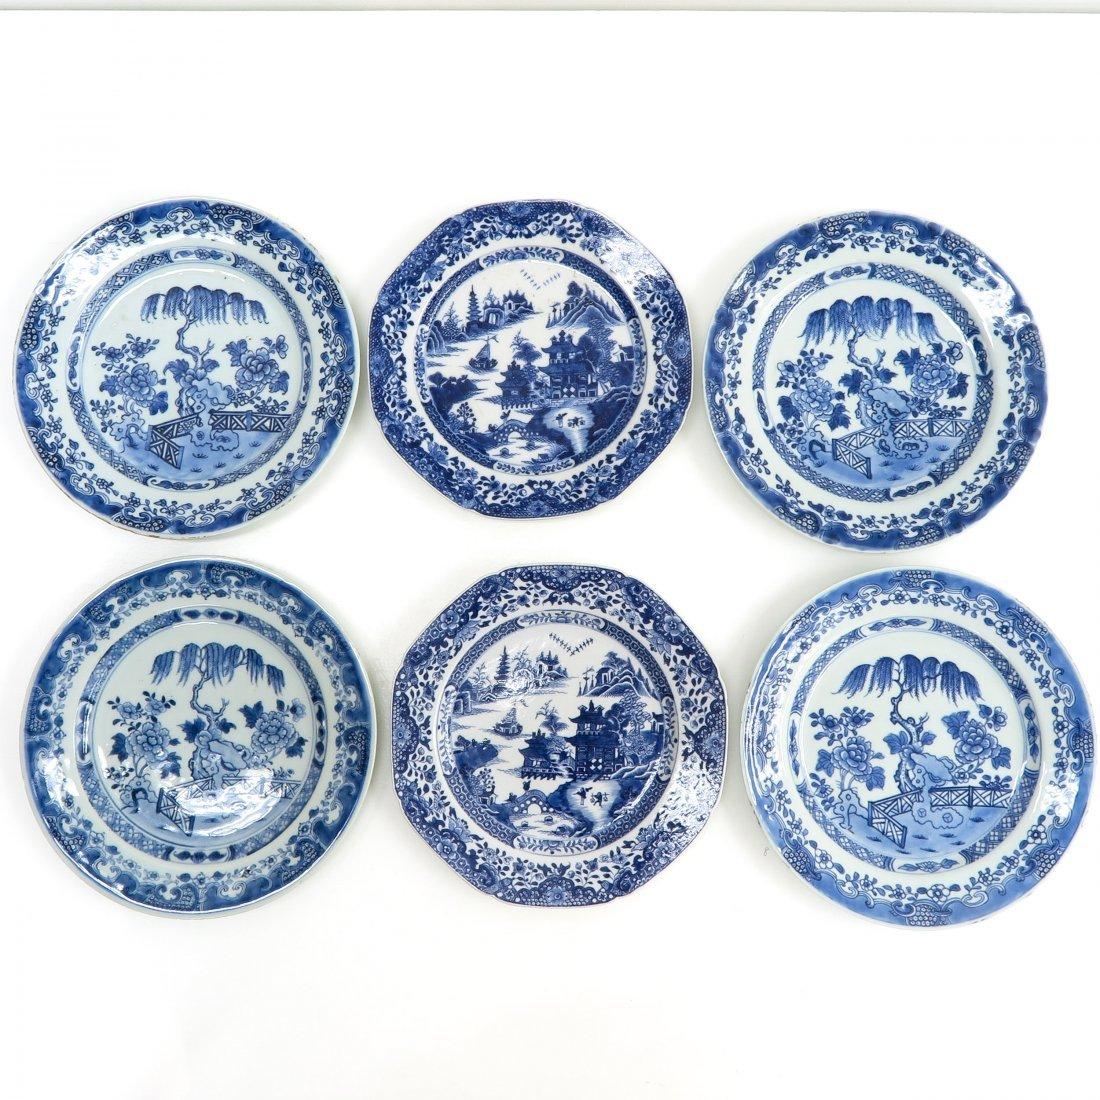 18th Century China Porcelain Plates